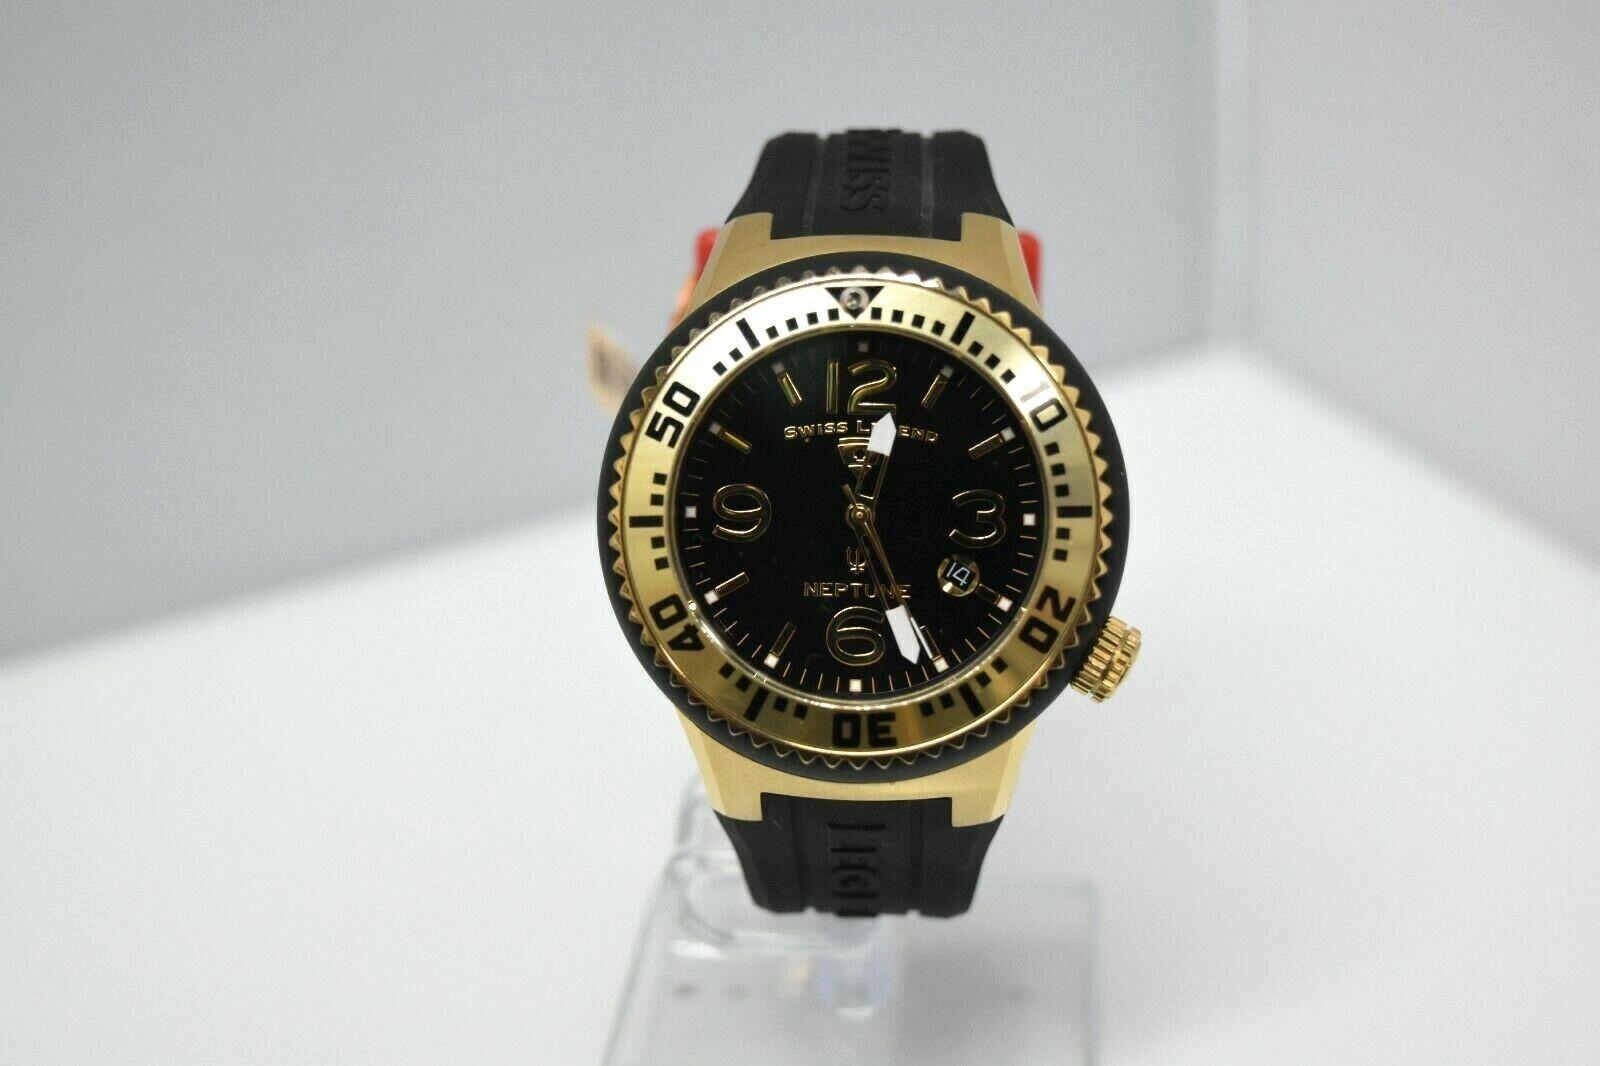 Swiss Legend Swiss Sapphitek 48mm SL-21848P Watch Black/YG/Black